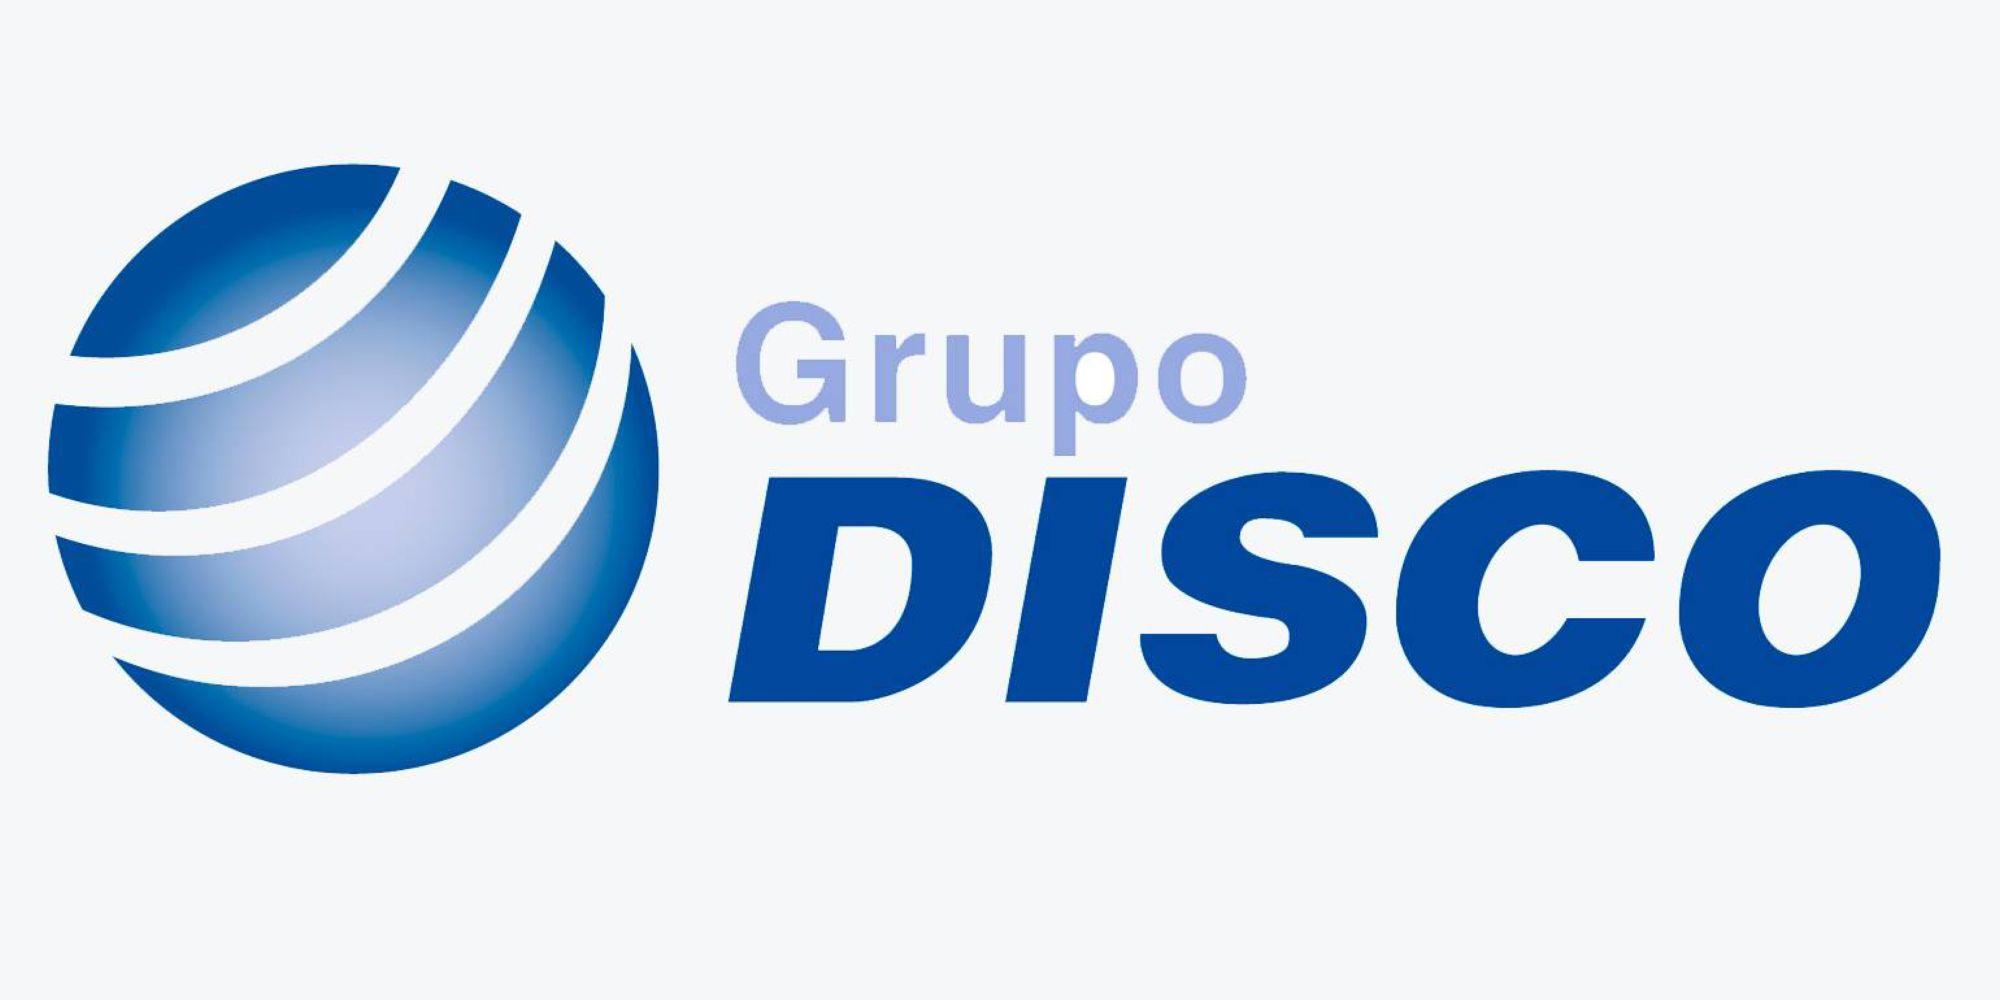 Imag-PT-testo-distri-disco-1540x770.jpg